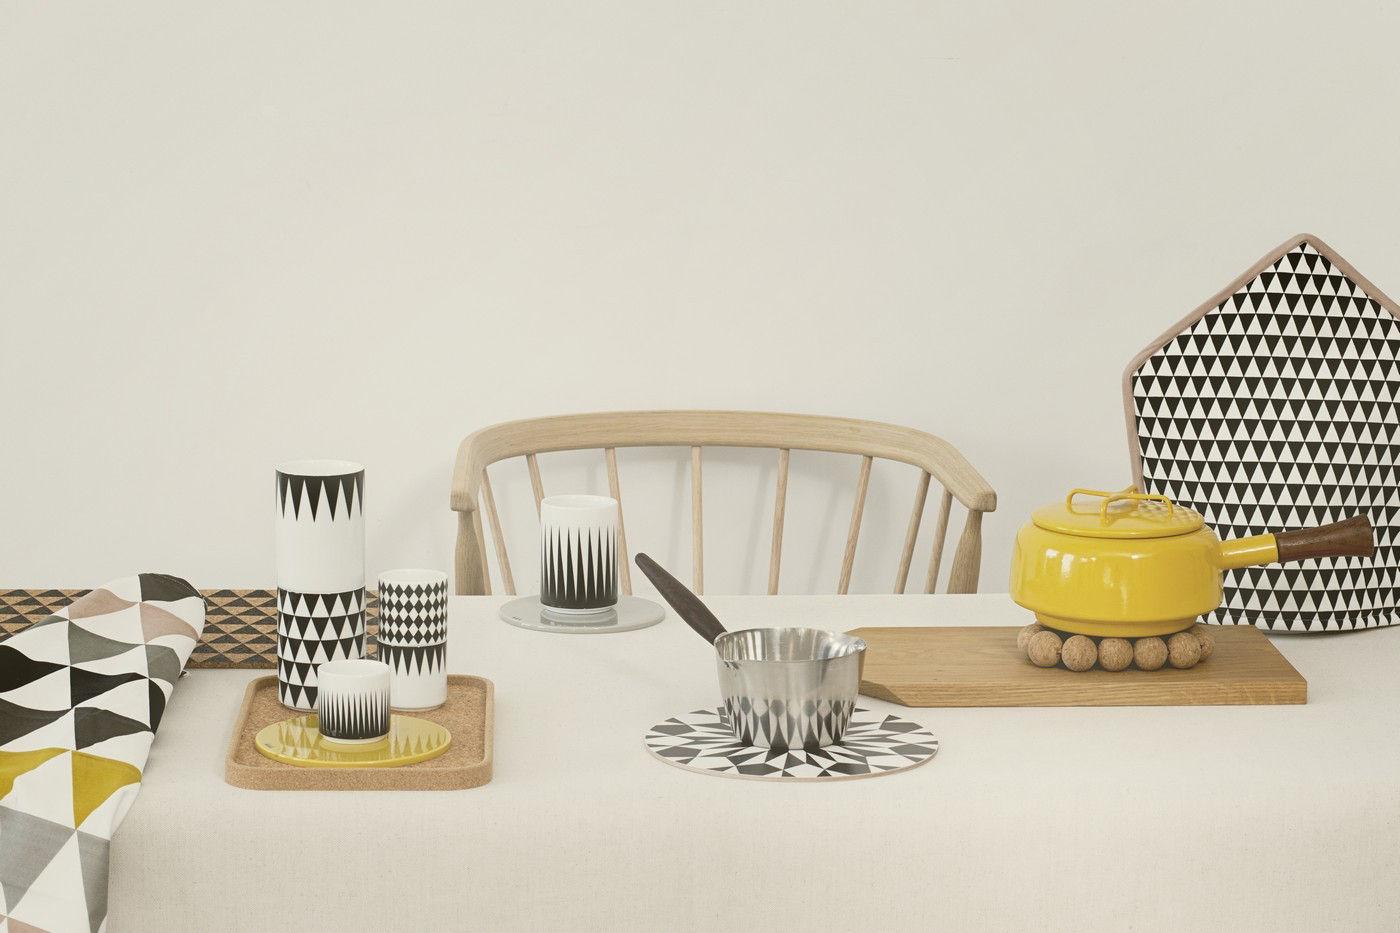 star schneidebrett 23 cm ferm living topfuntersetzer. Black Bedroom Furniture Sets. Home Design Ideas